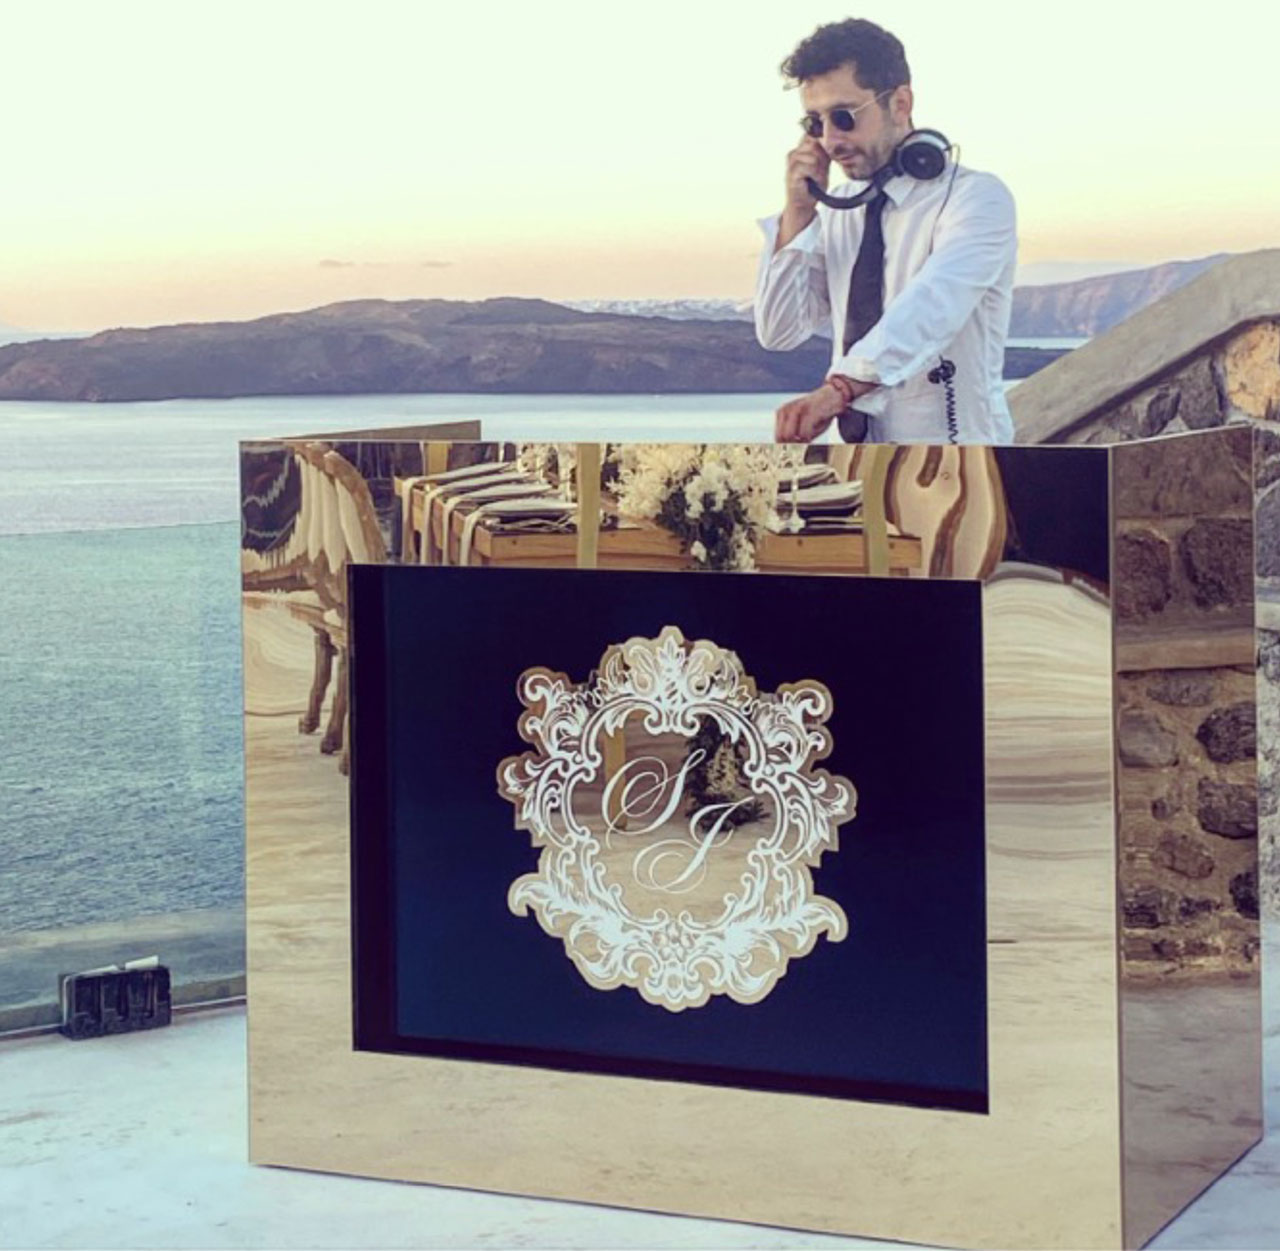 Свадебный Dj на Санторини: свадьба на санторини, свадебное агентство Julia Veselova - Фото 1